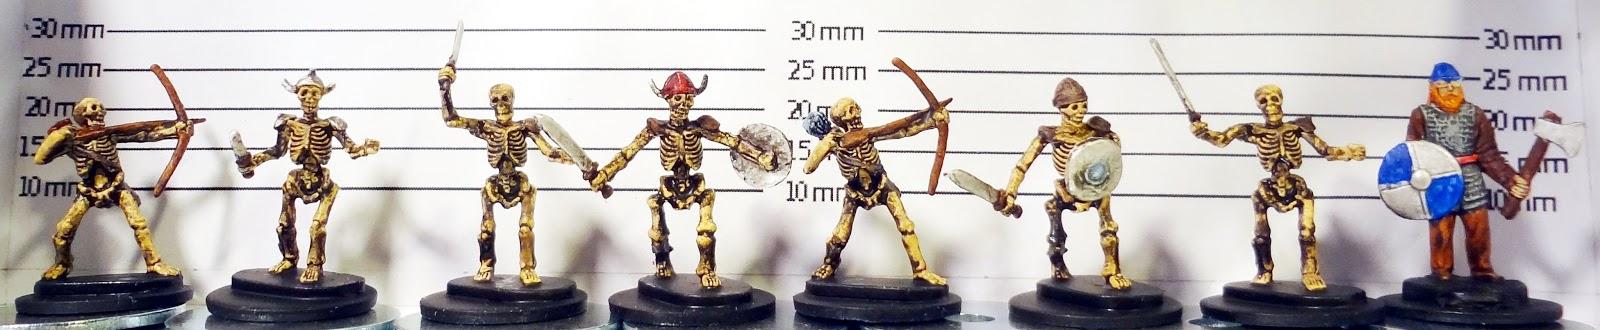 15mm minis vs  Tiles - Dwarven Forge